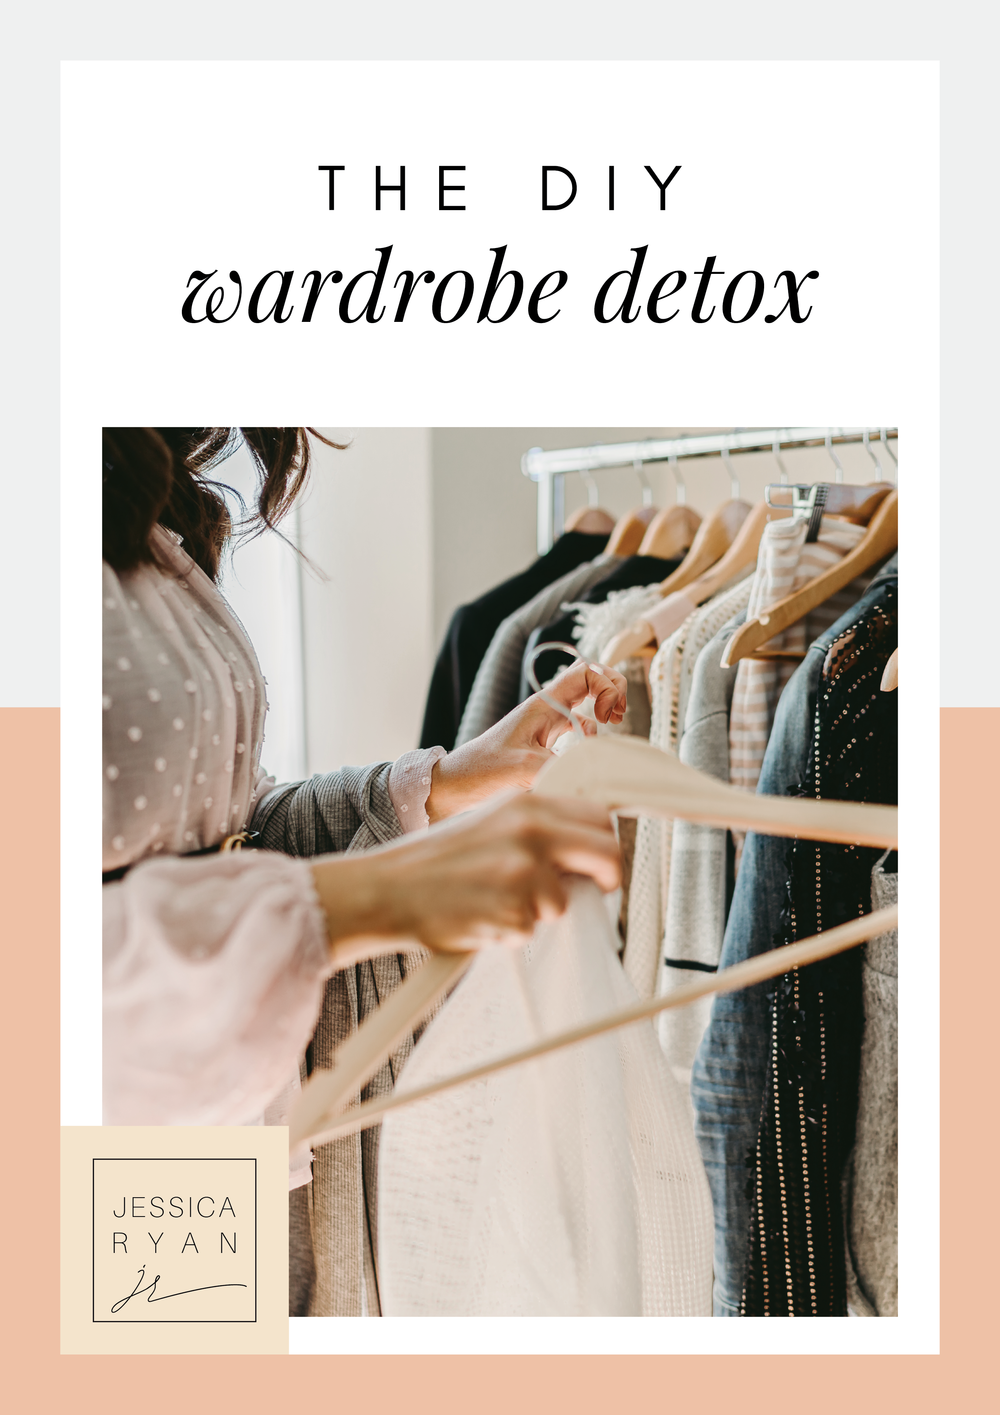 The DIY Wardrobe Detox - Jessica Ryan.png